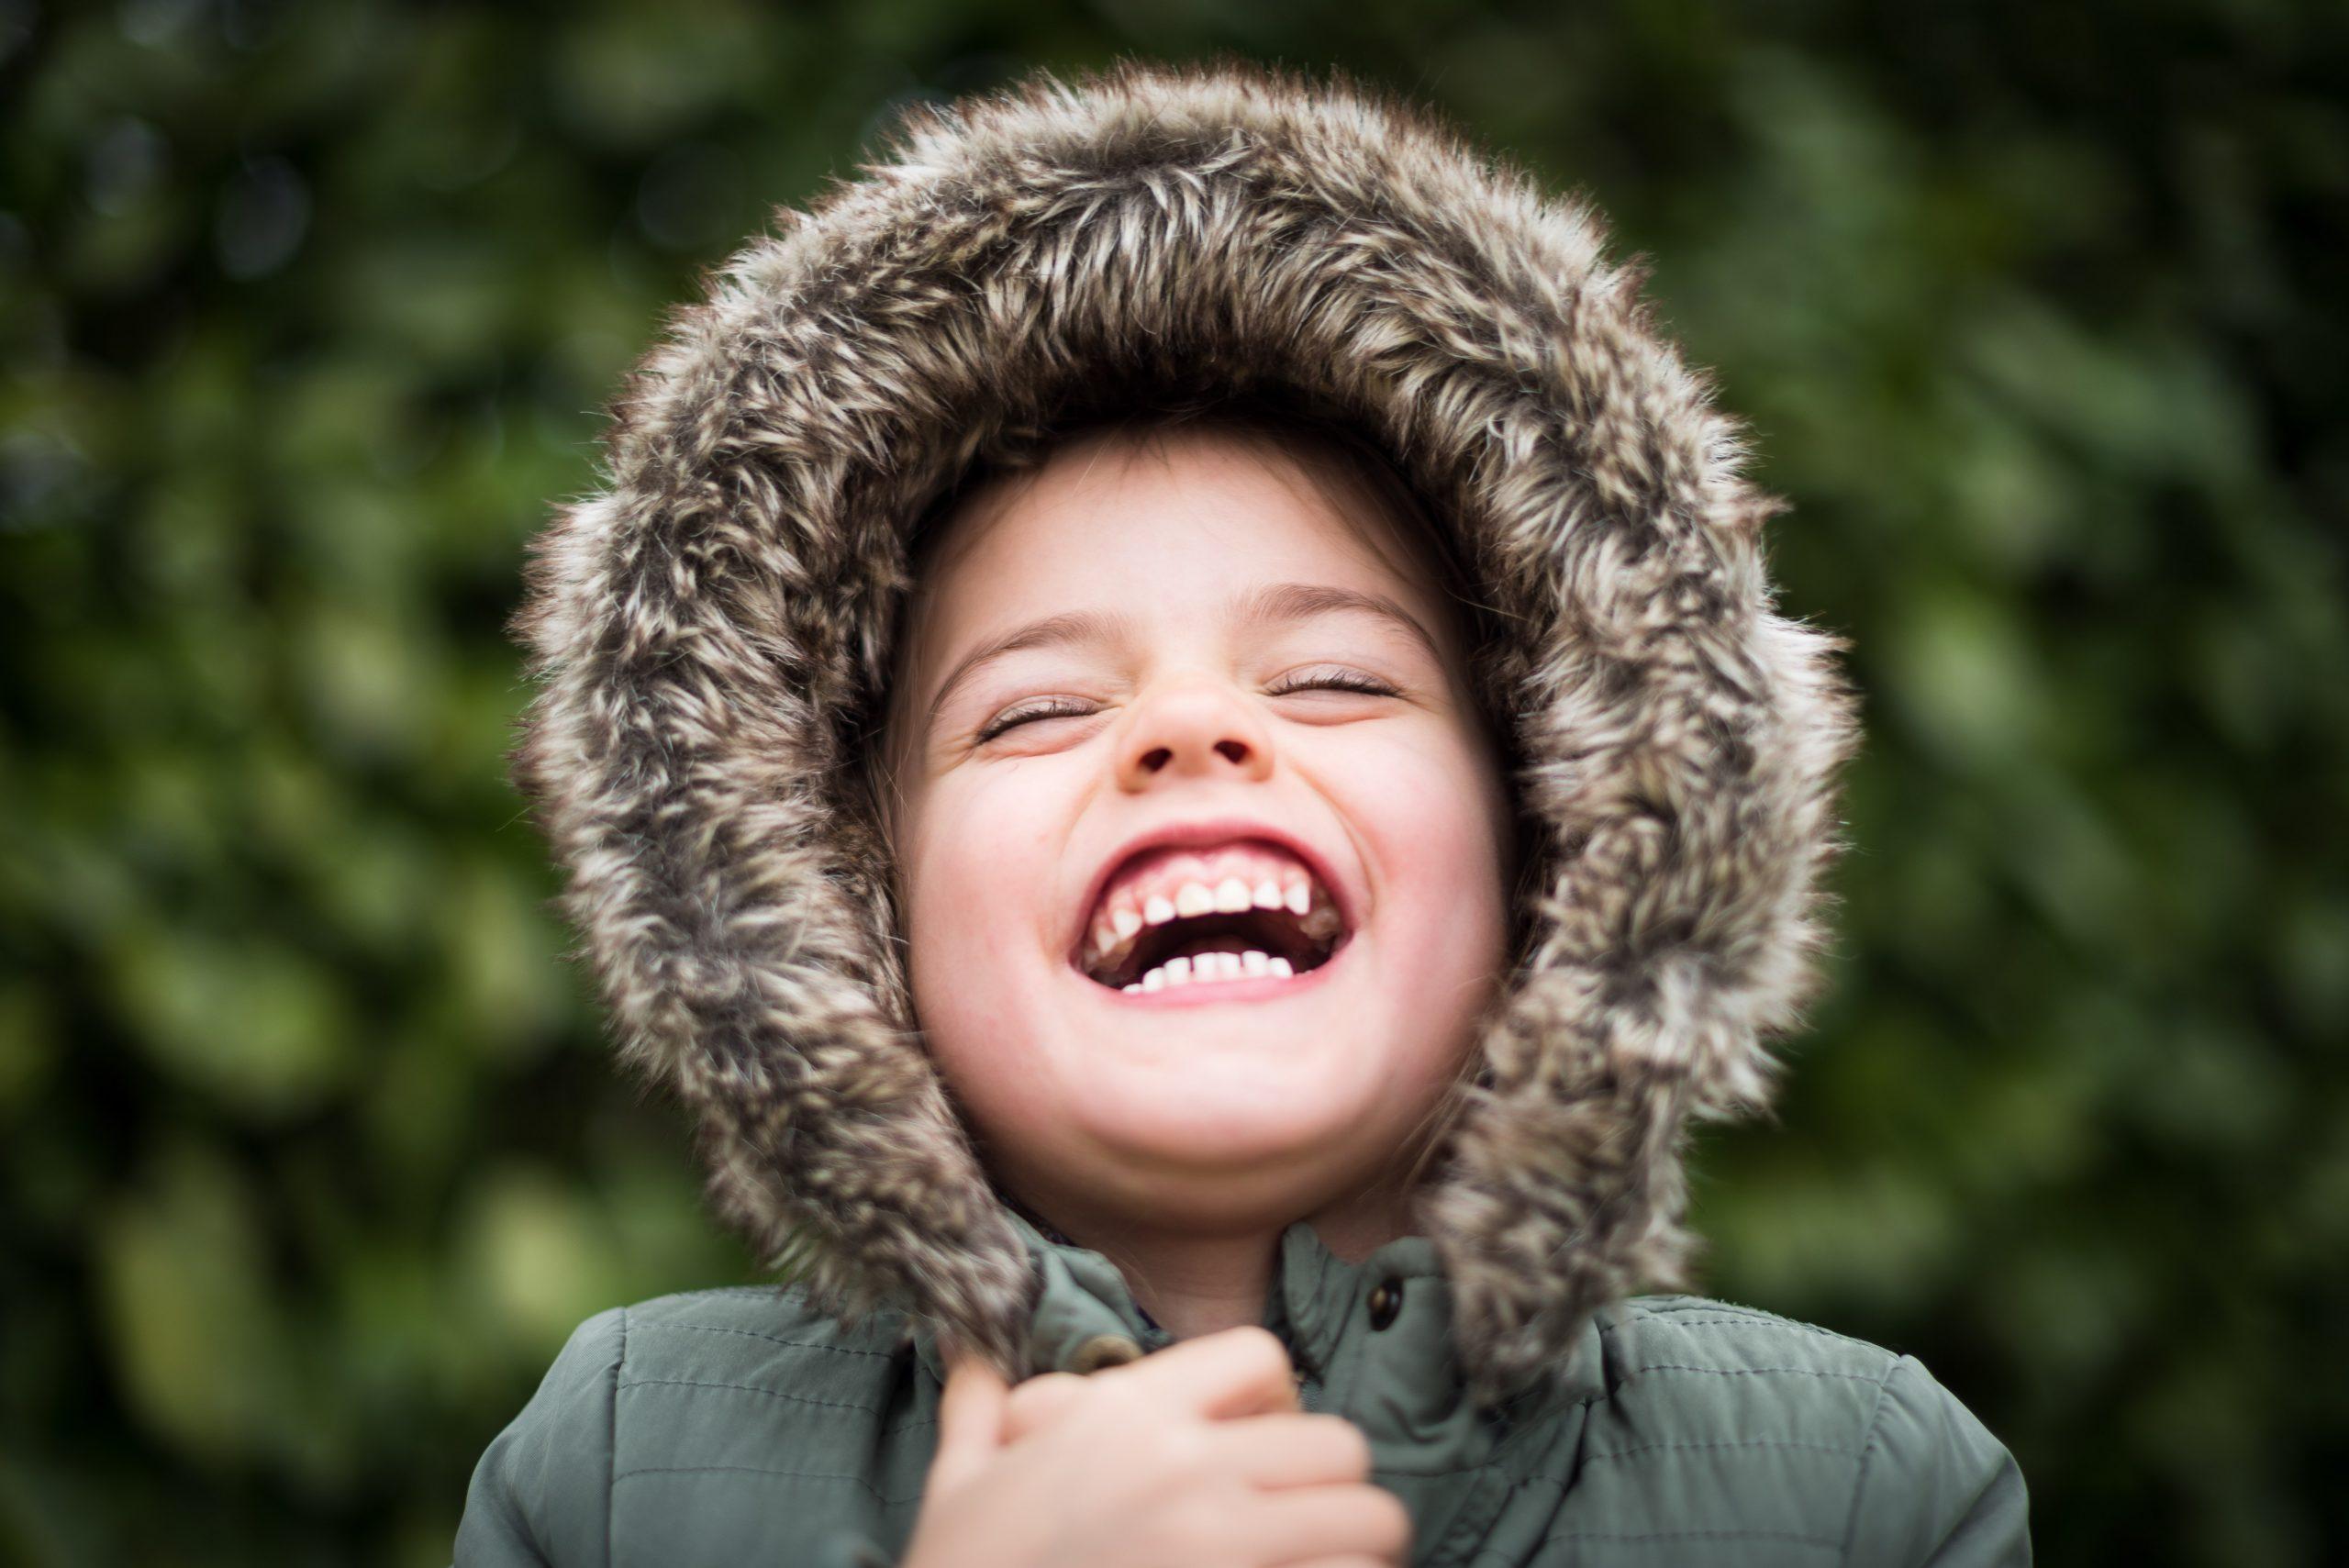 How To Keep Your Teeth Healthy - Dentist Colorado Springs